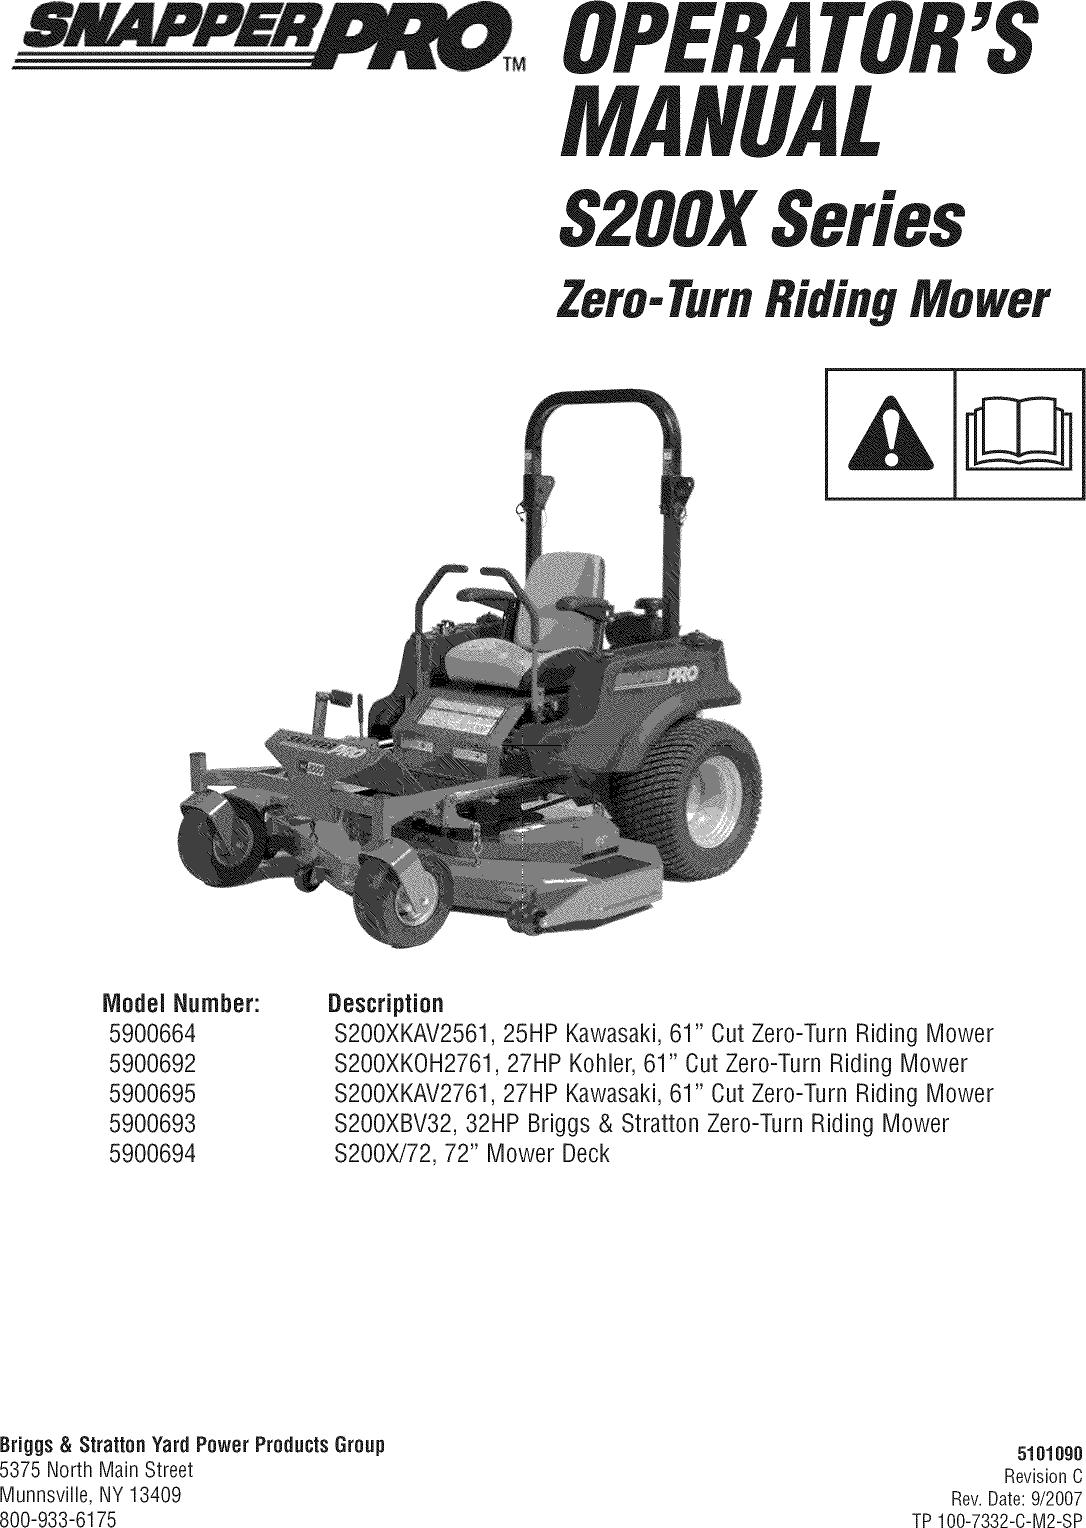 SNAPPER Lawn, Riding Mower Rear Engine Manual L0808227